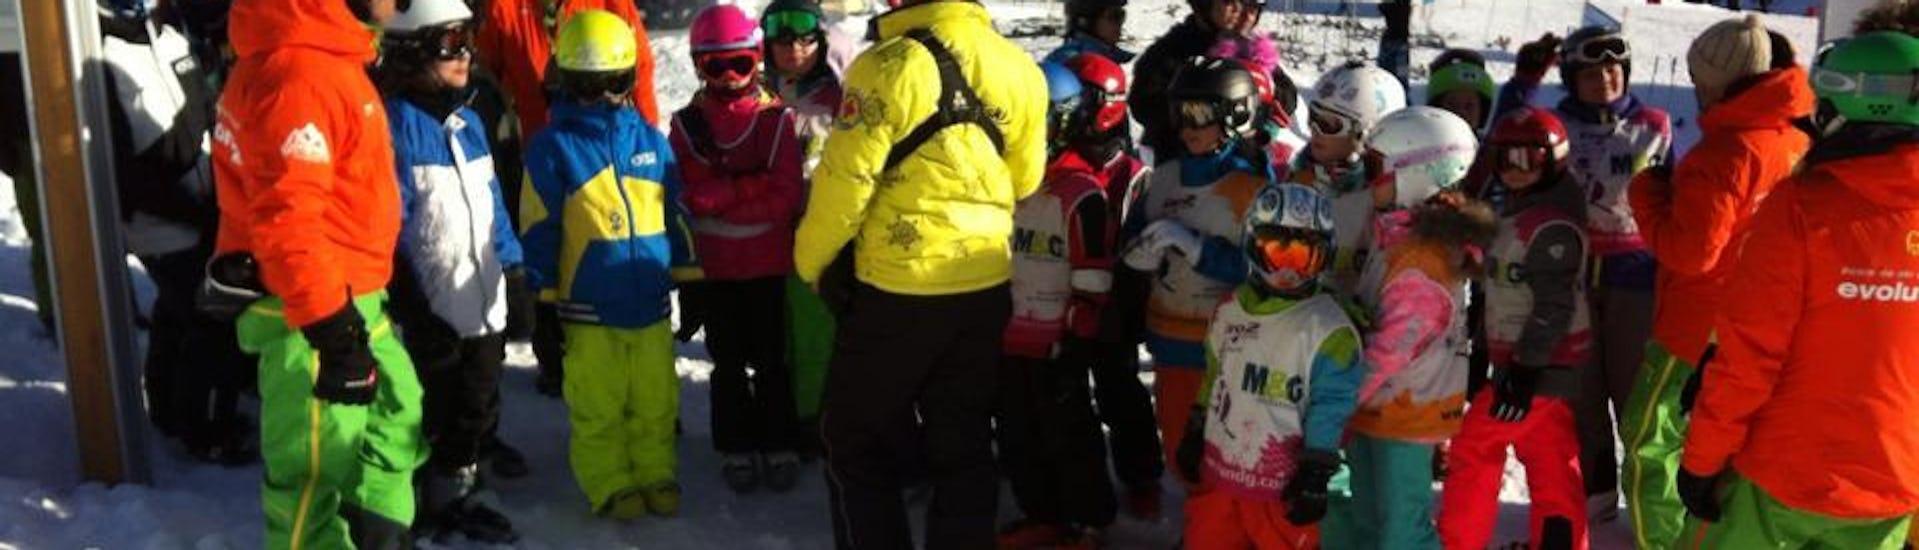 "Ski Club ""Cariboo"" for Kids (5-12 years) - Arc 1950"